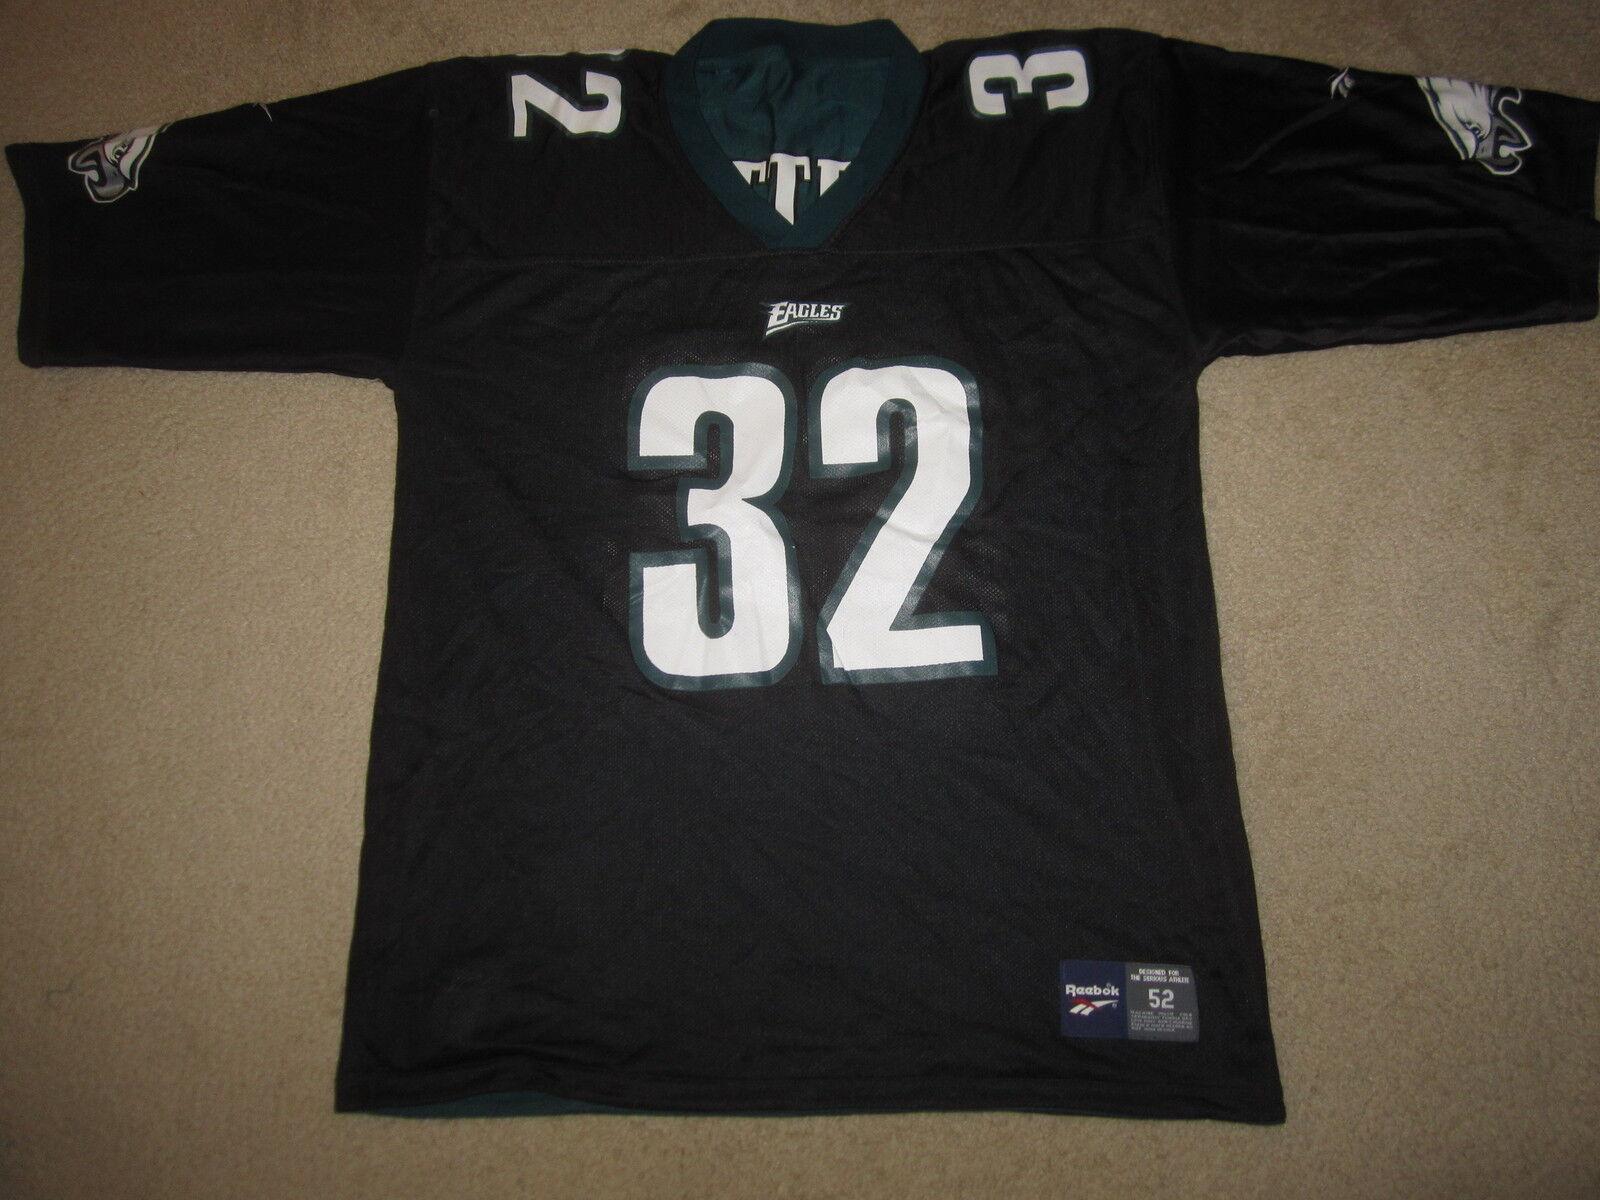 Philadelphia Eagles   32 NFL Schwarz Reebok Trikot 52  | Neue Produkte im Jahr 2019